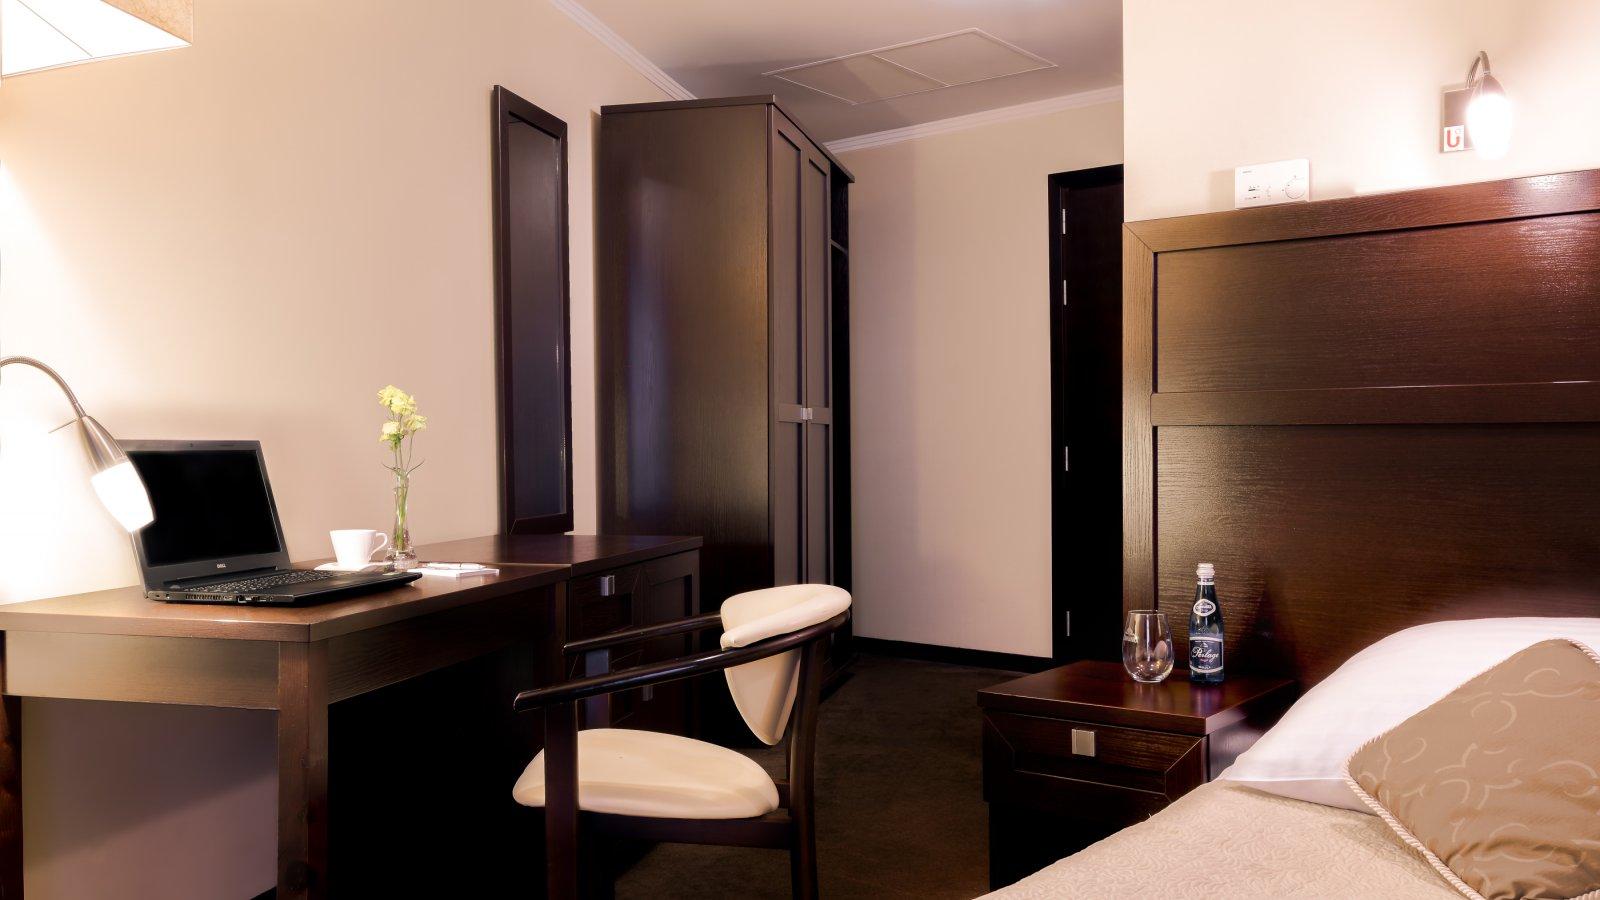 Hotell Aurora room-2